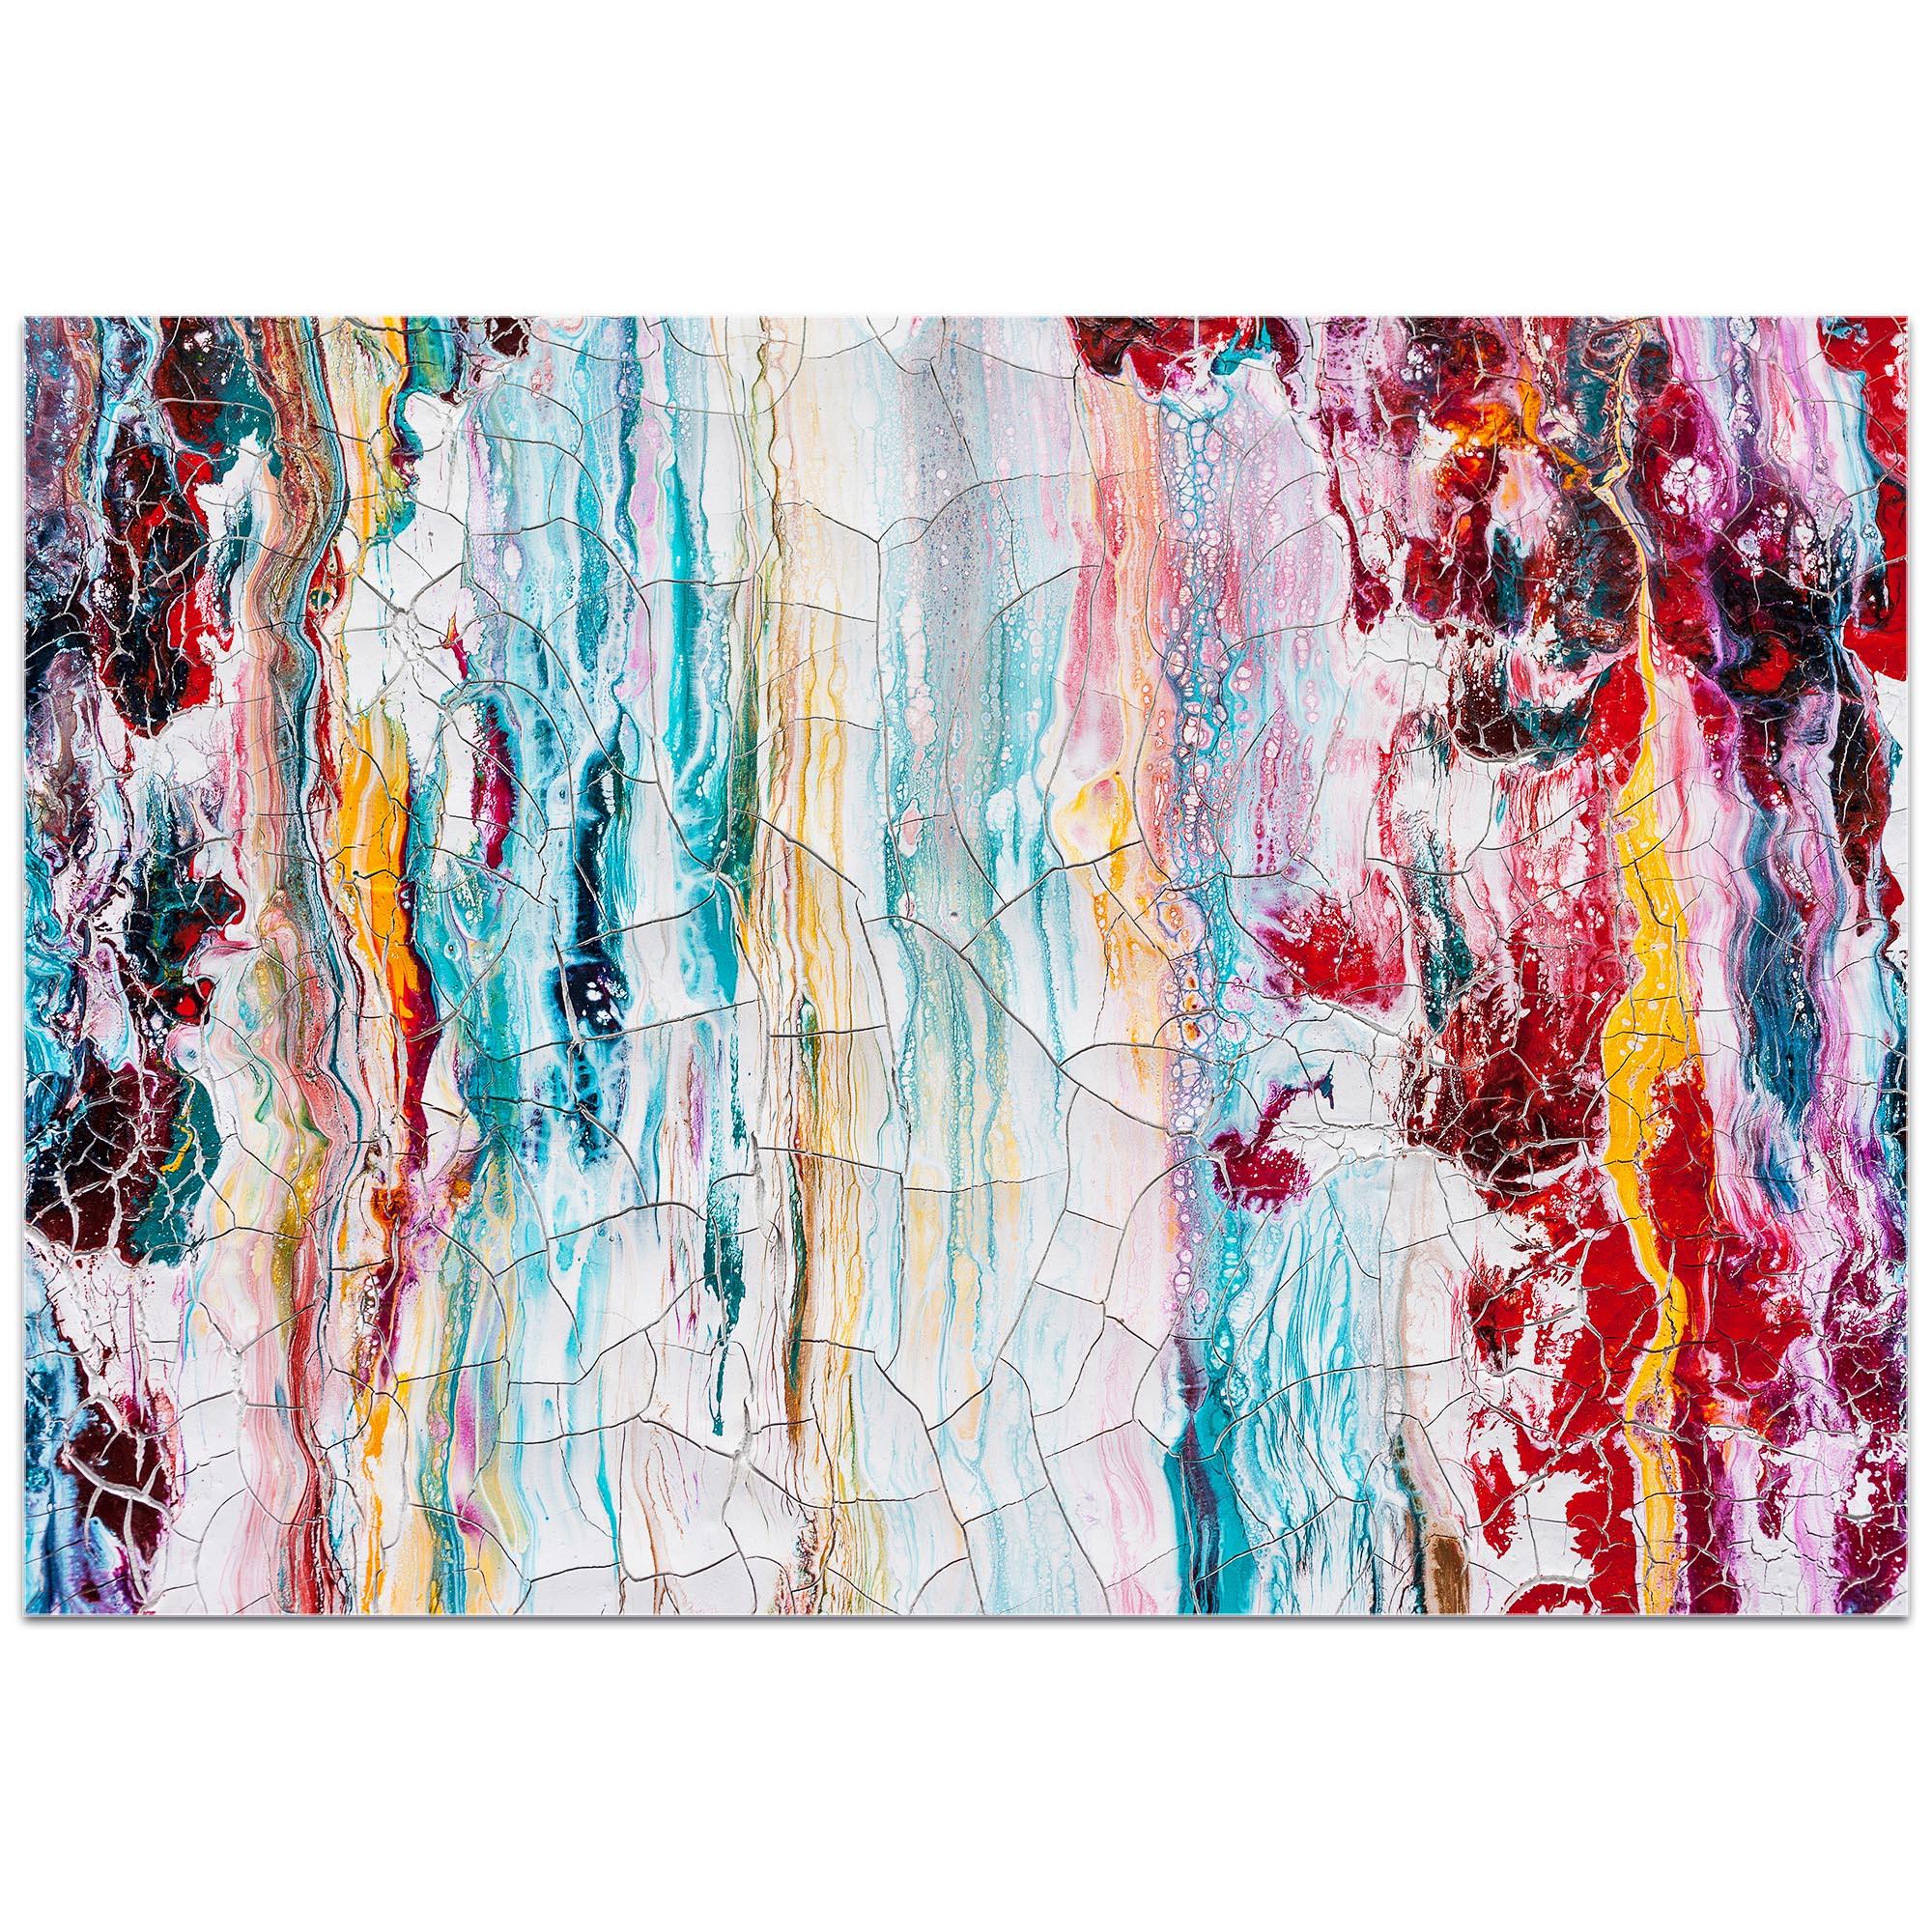 Abstract Wall Art 'Cracks 1' - Urban Decor on Metal or Plexiglass - Image 2